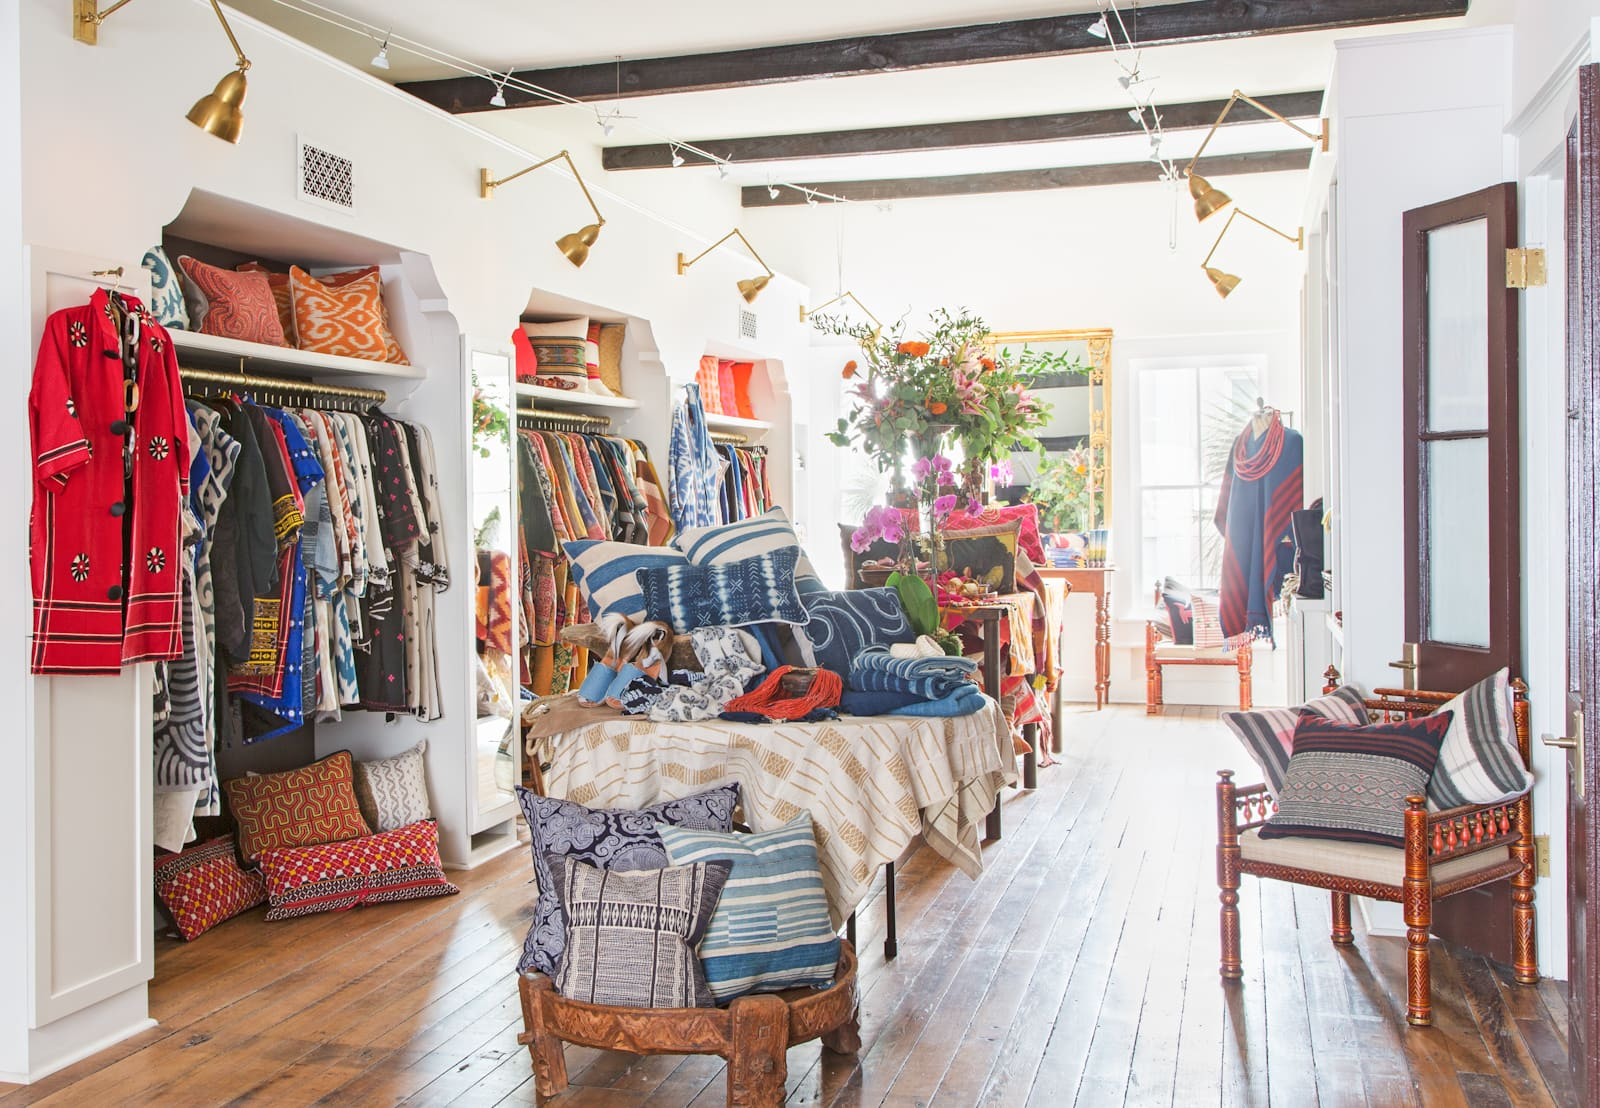 IBU showroom featured on Cindy Hattersley's blog